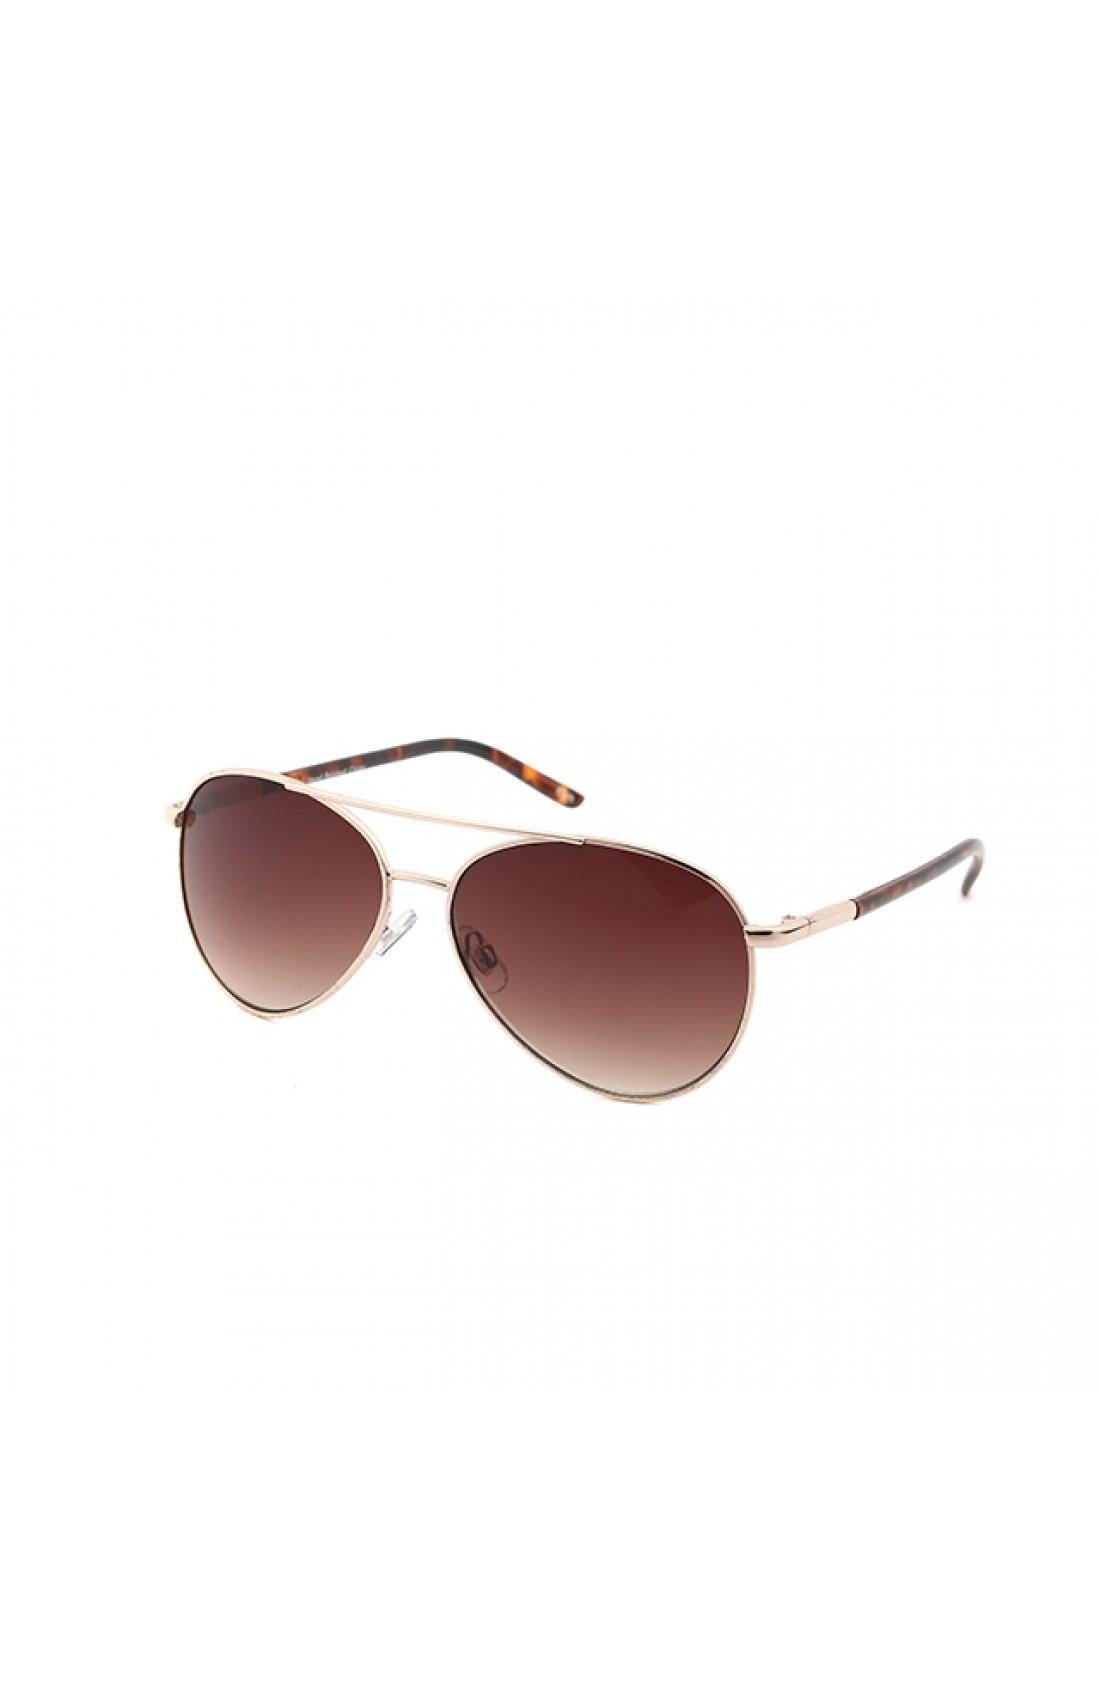 Sunglasses Style 222742